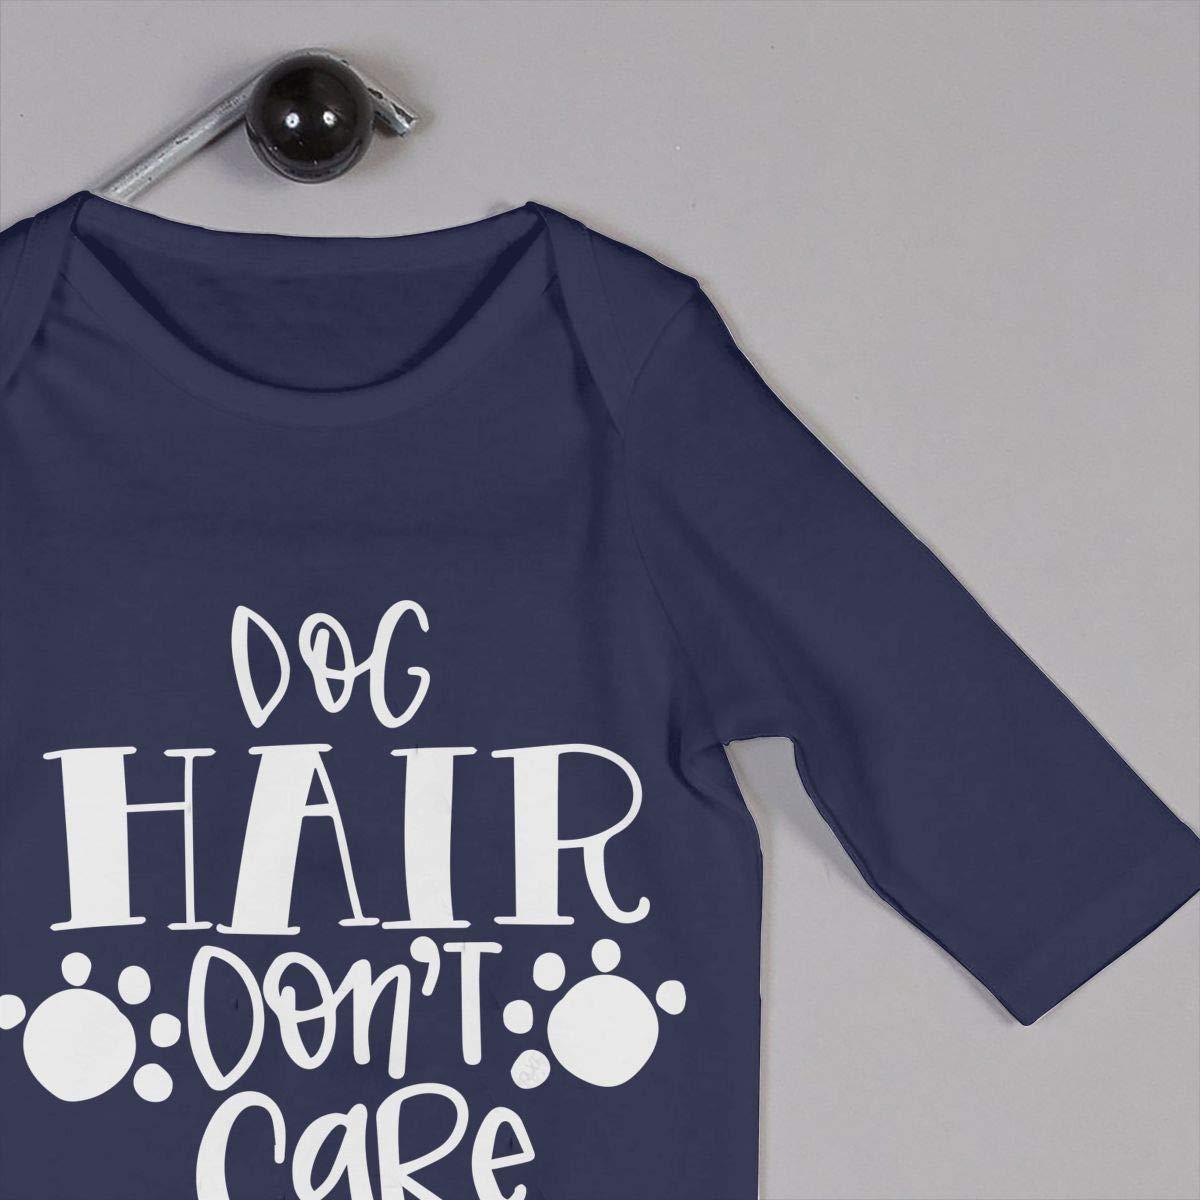 Mri-le1 Newborn Kids Long Sleeve Jumpsuit Dog Hair Dont Care Kid Pajamas